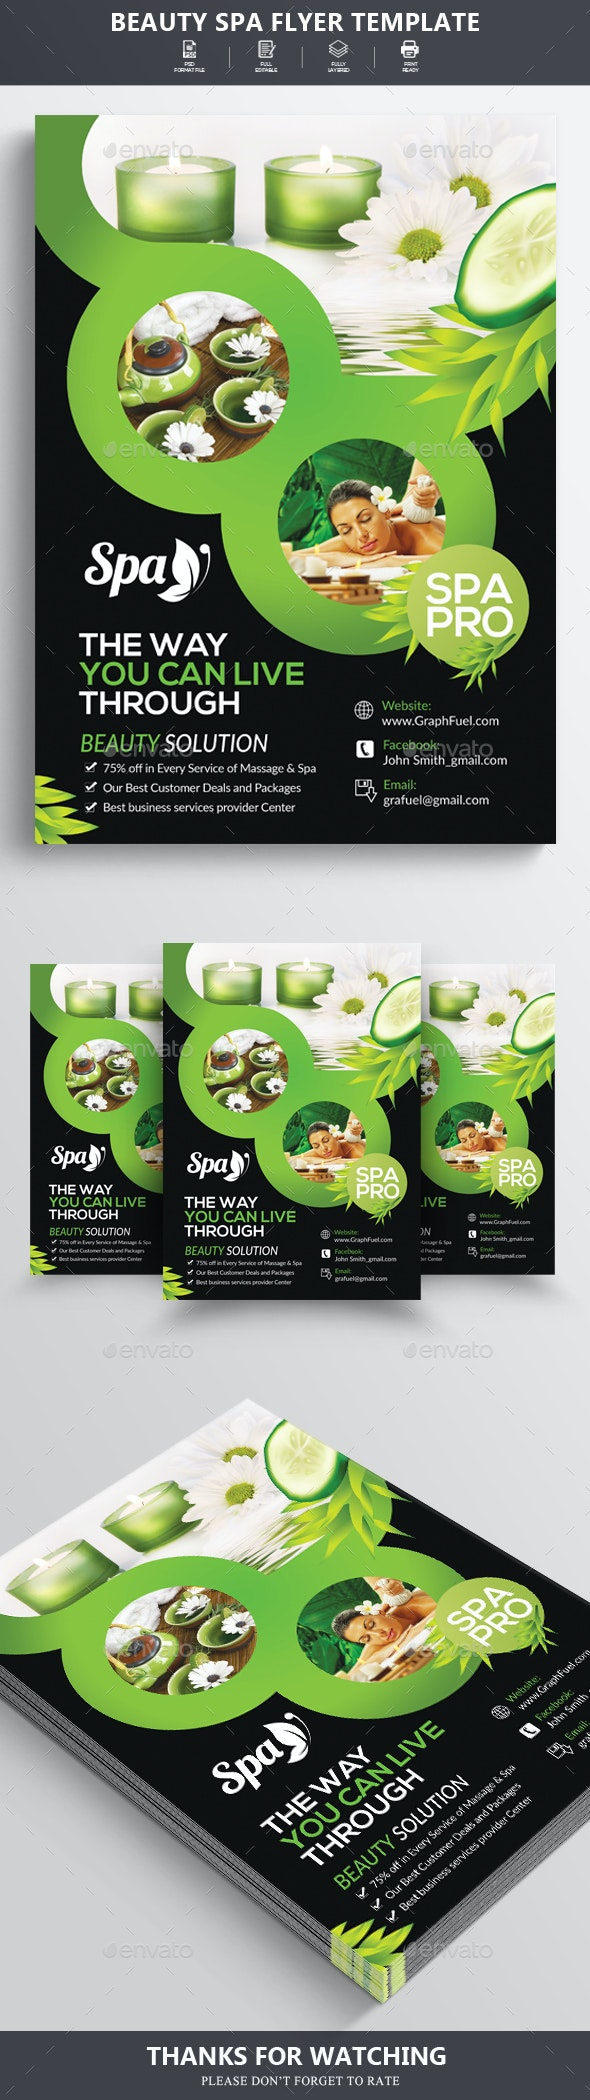 Beauty Spa & Massage Center Flyer - Flyers Print Templates